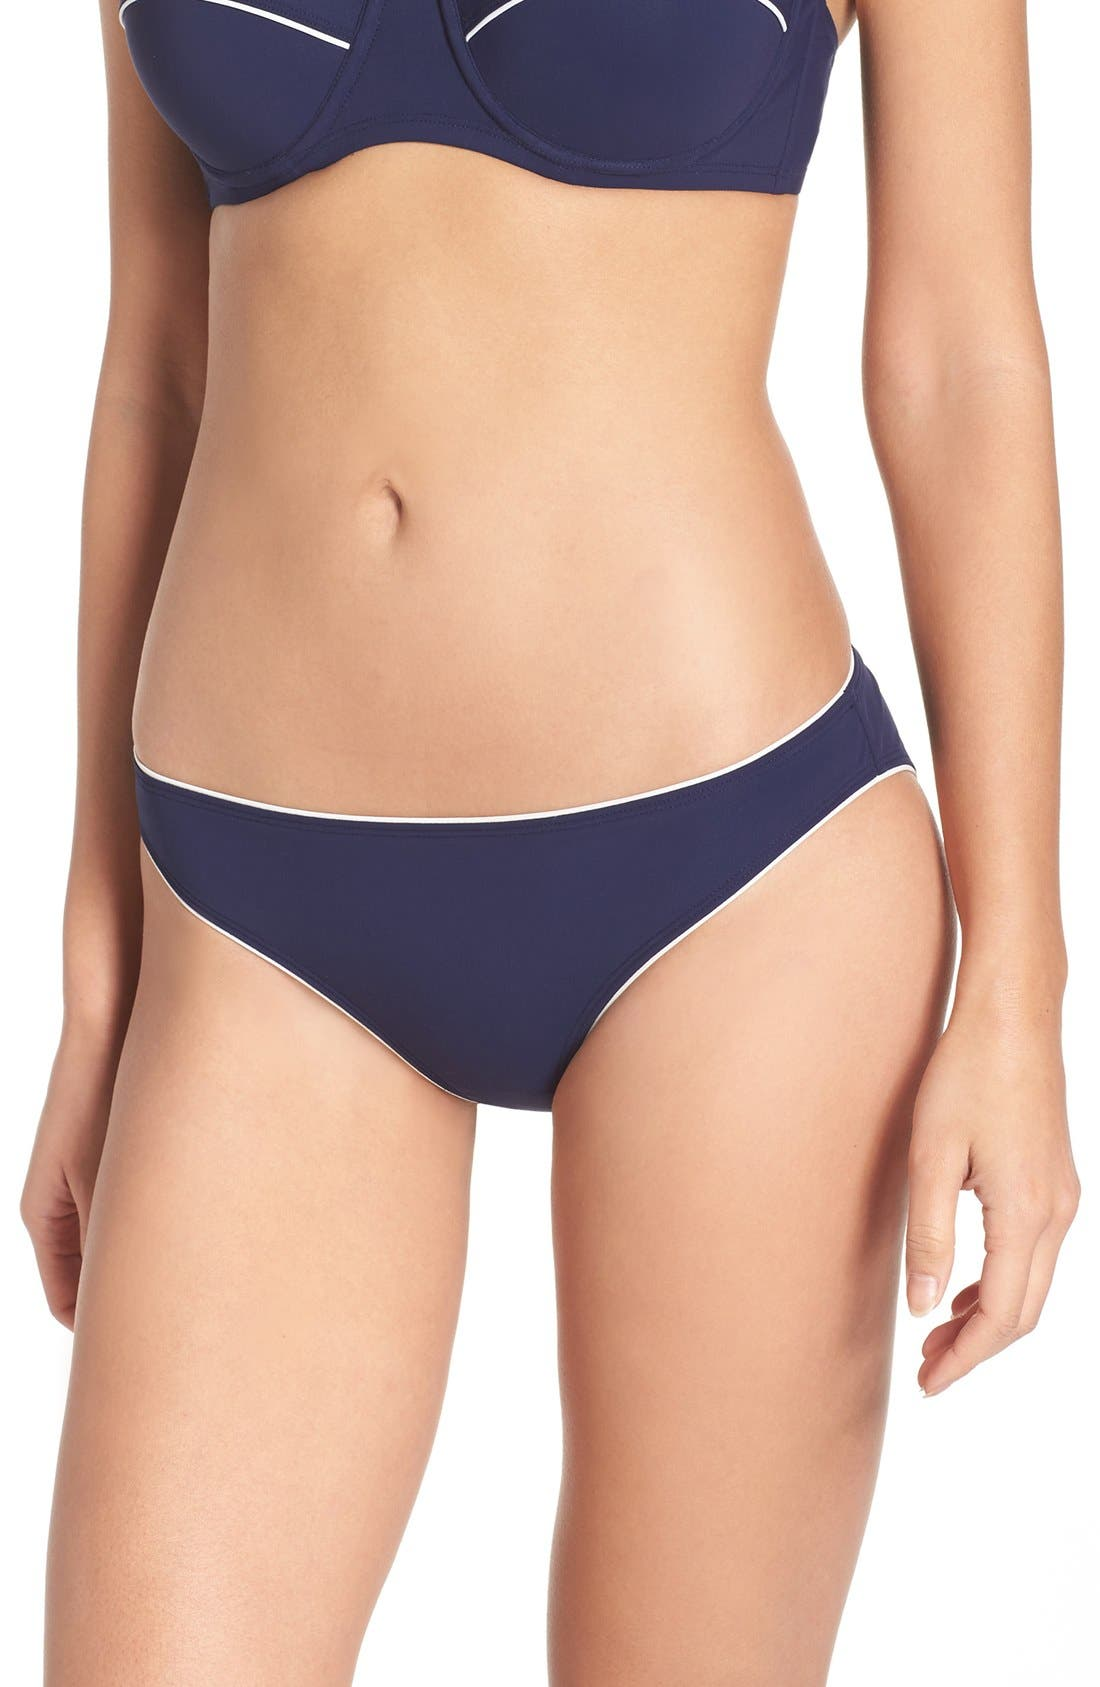 Riviera Hipster Bikini Bottoms,                         Main,                         color, Blue